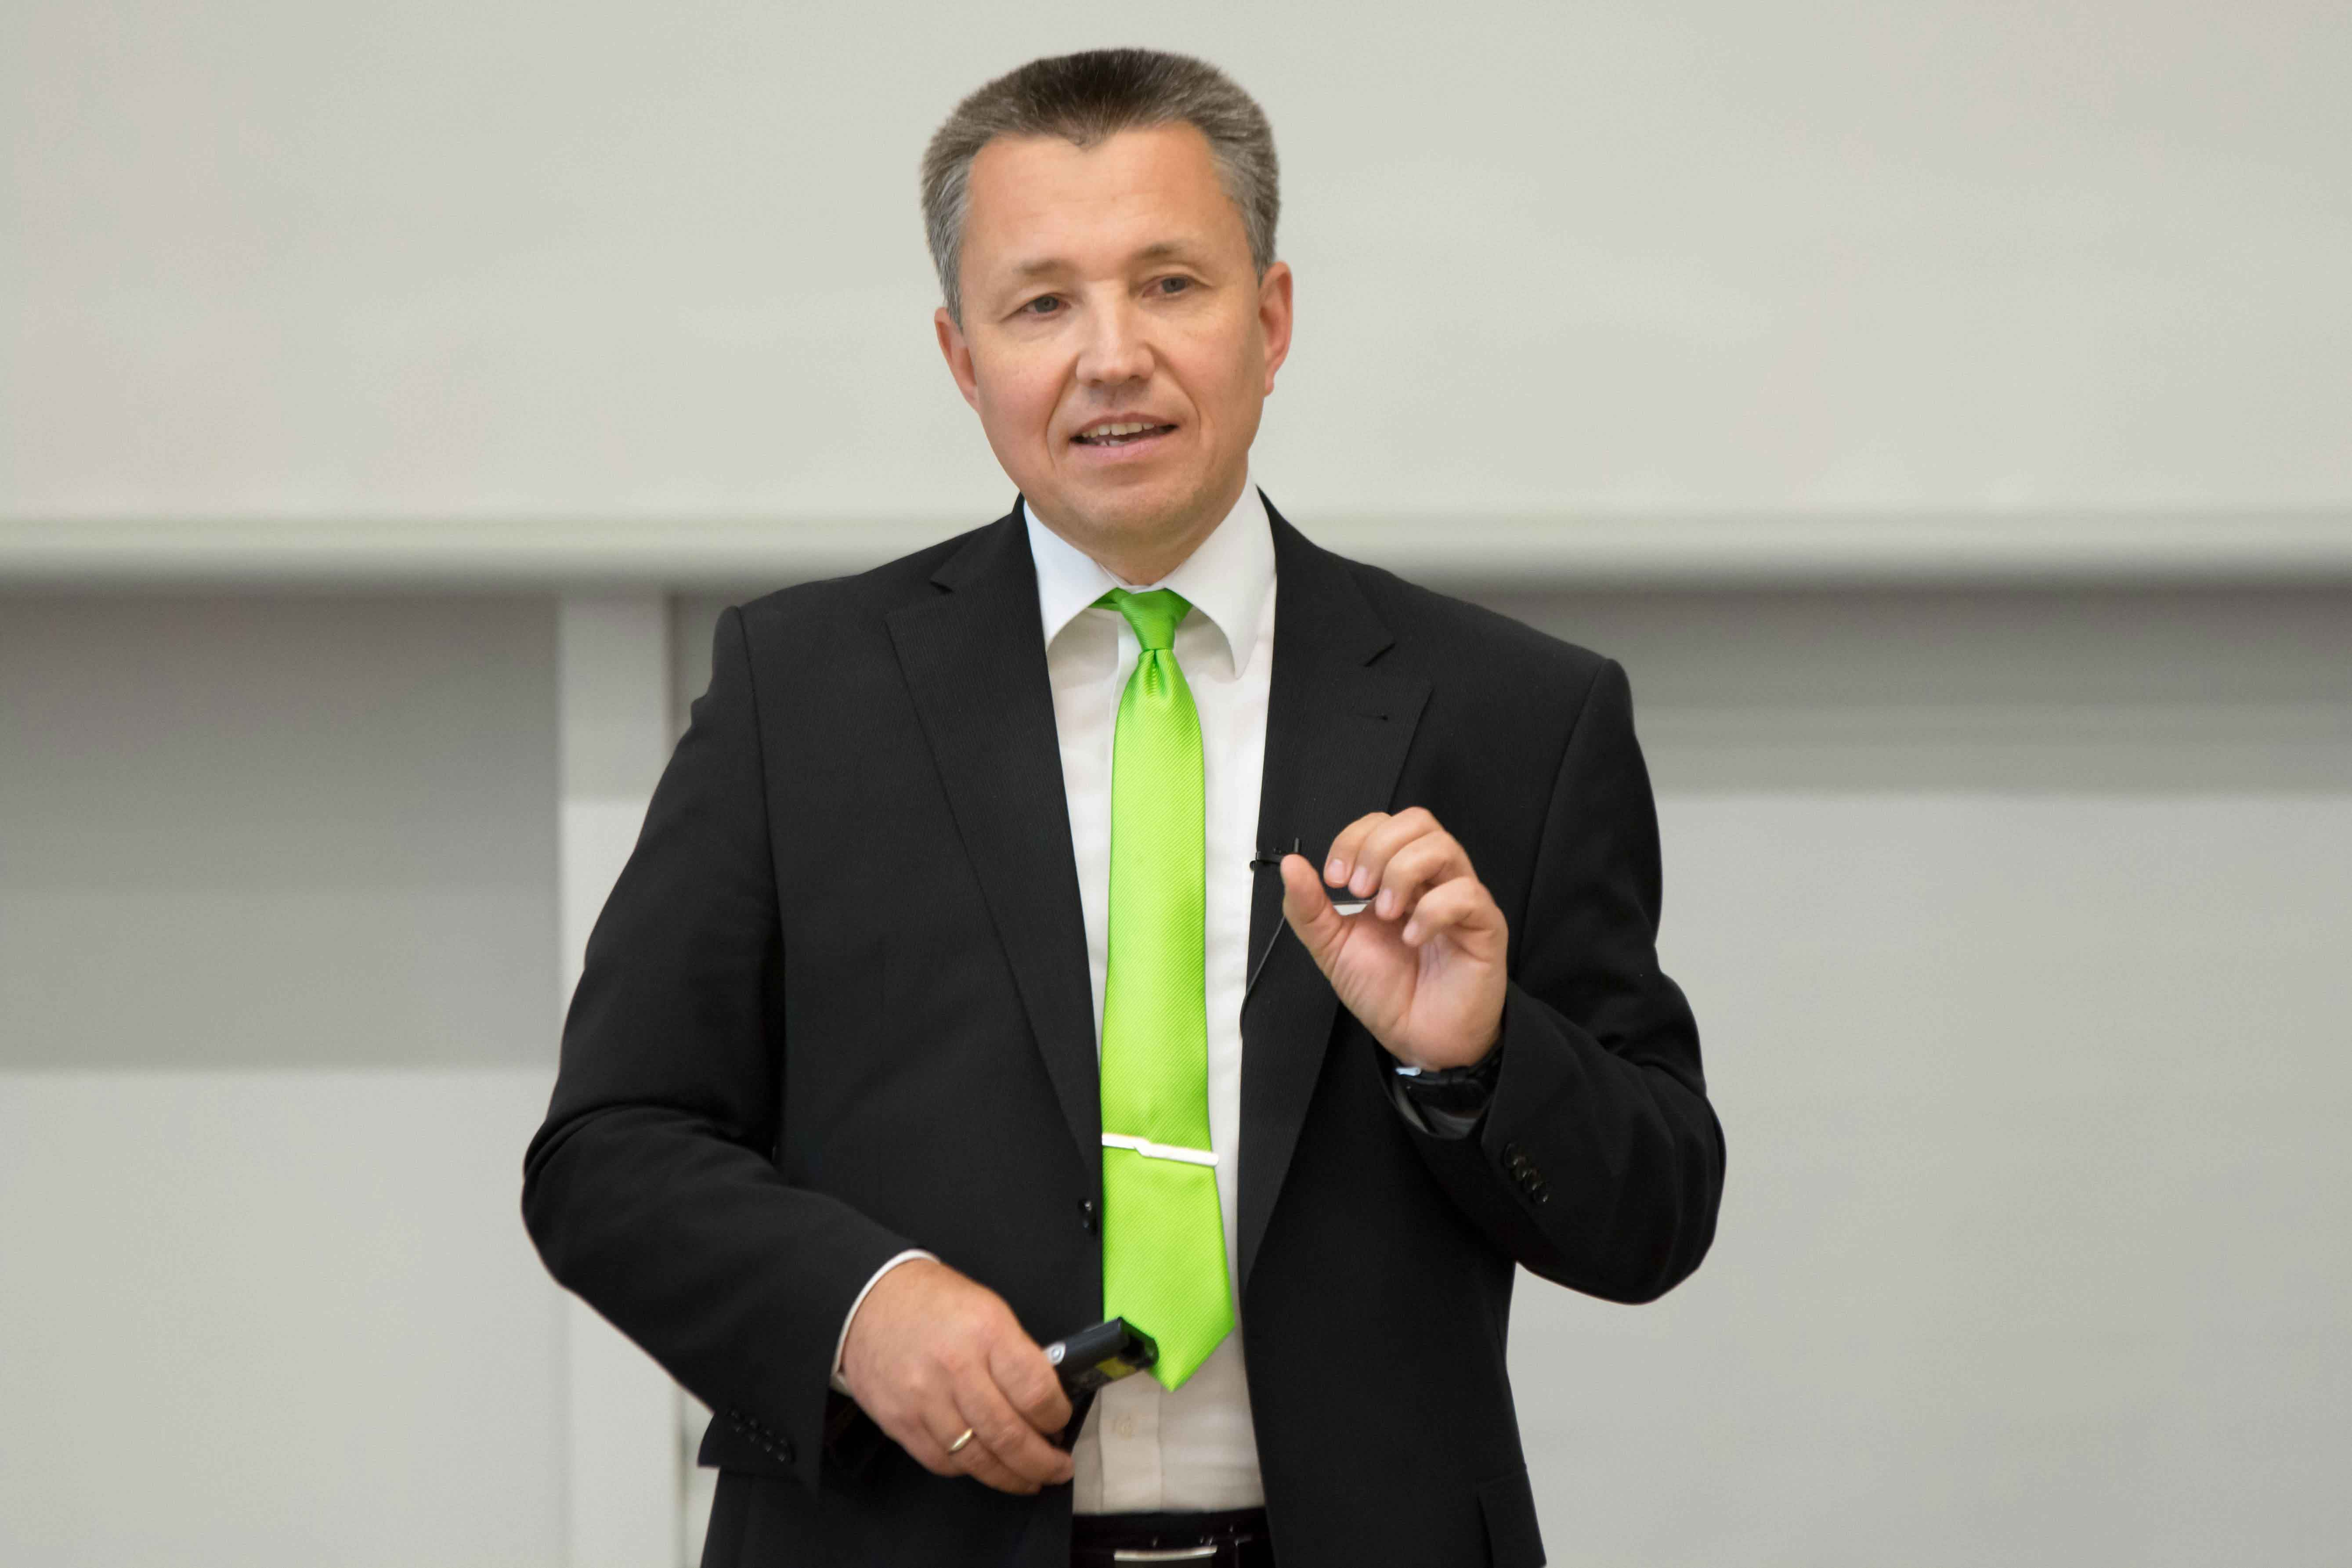 Herr Rudat zum KOMMUNIKATIONS-FORUM